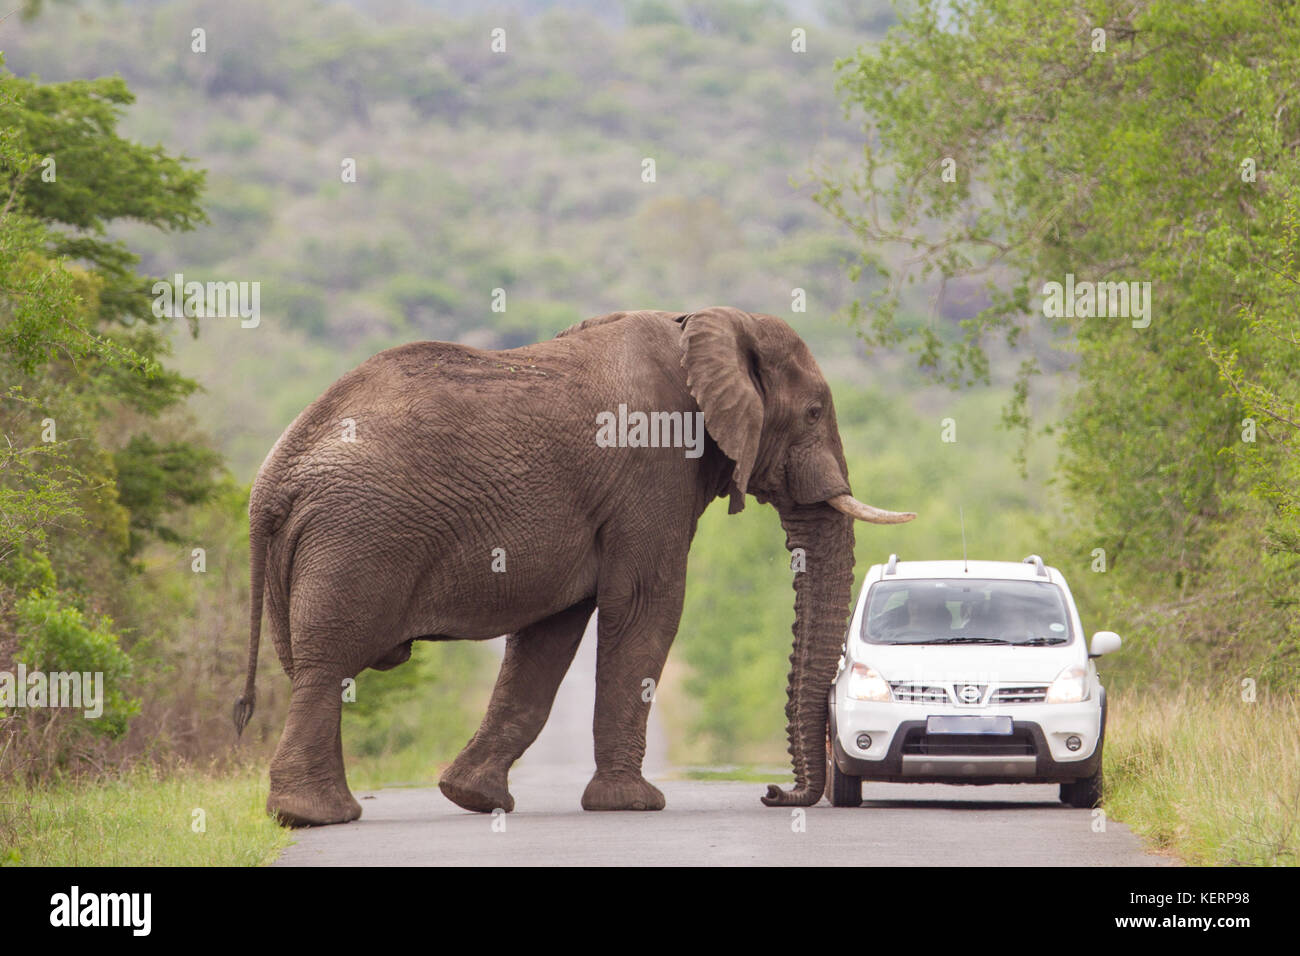 Elephant Auto Insurance Quote Elephant Car Stock Photos & Elephant Car Stock Images  Alamy